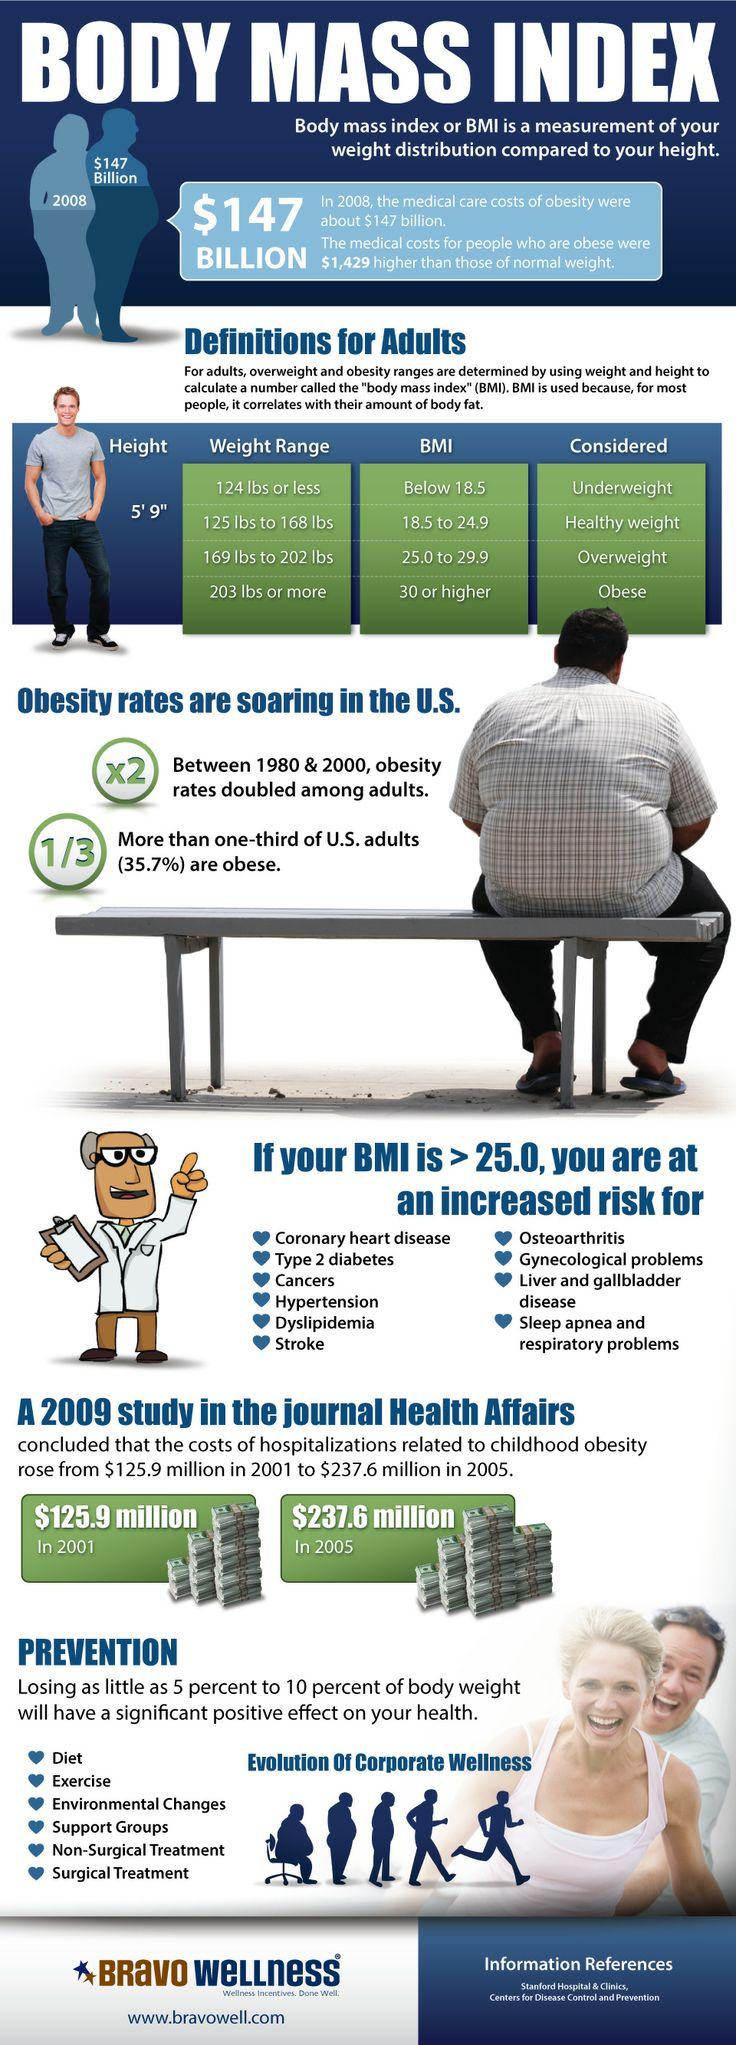 Body Mass Index BMI Infographic we created for Bravo Wellness